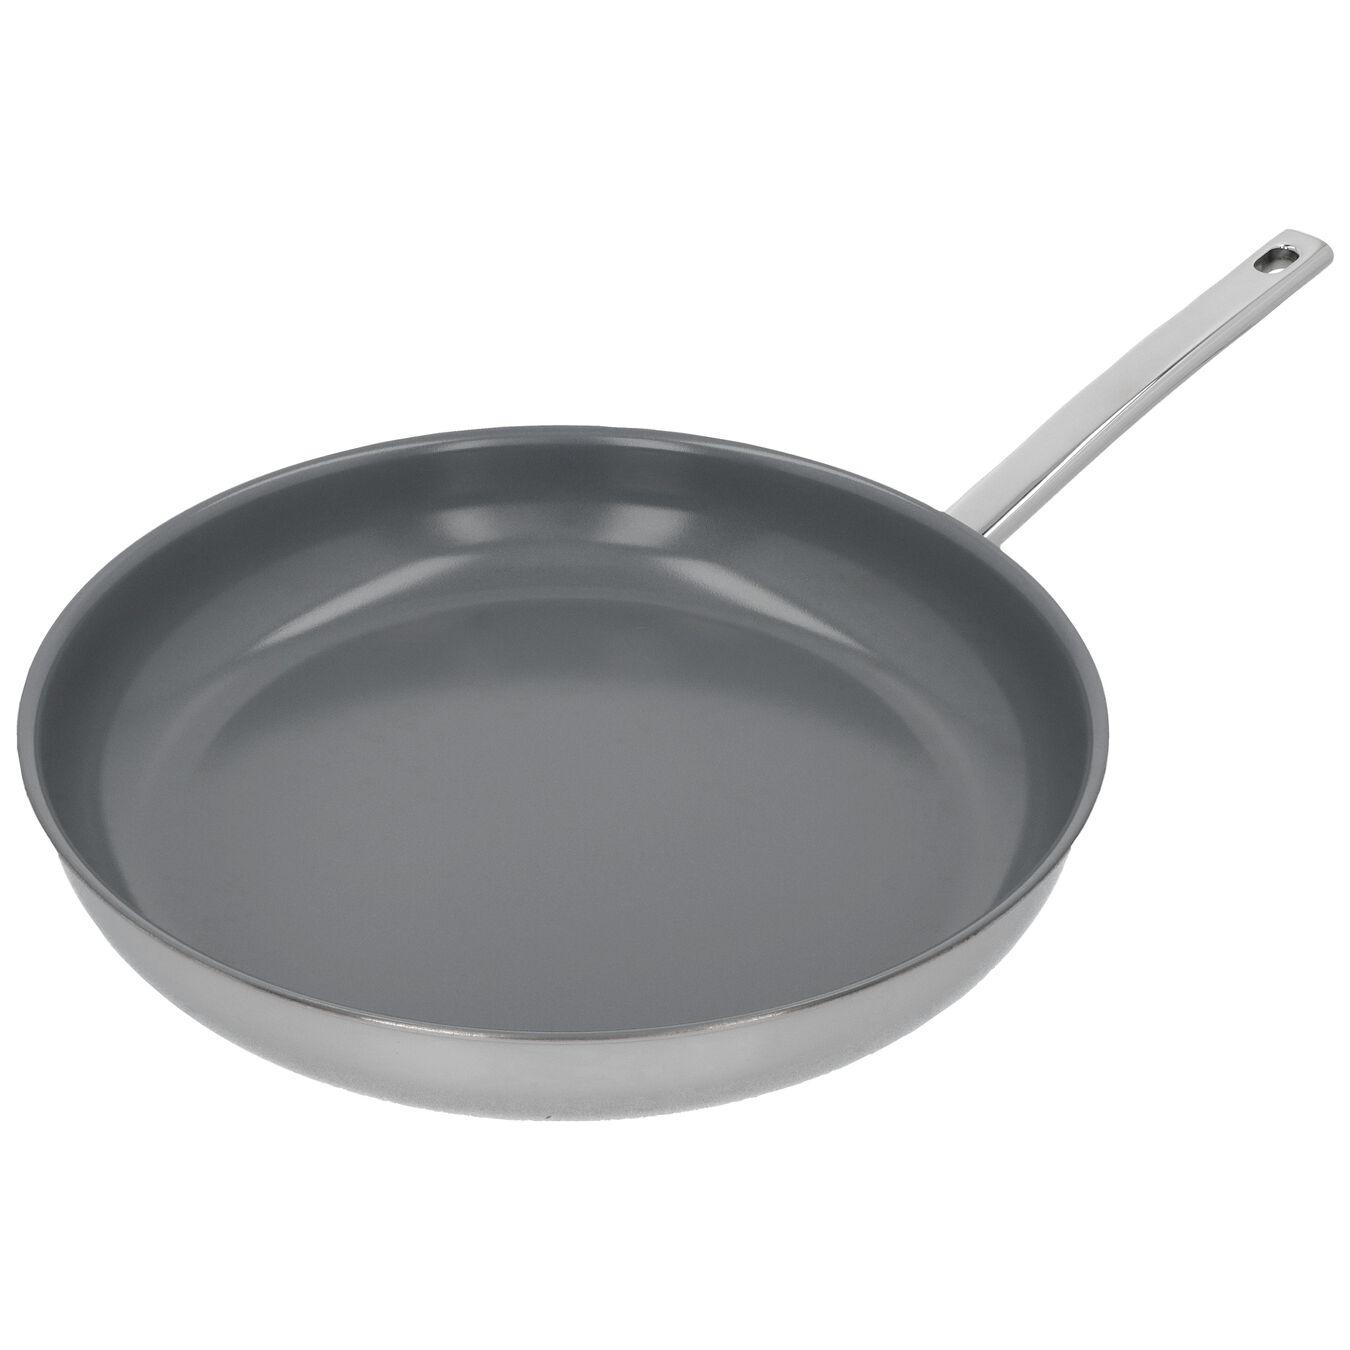 Stekpanna 32 cm, 18/10 Rostfritt stål, Silver,,large 2